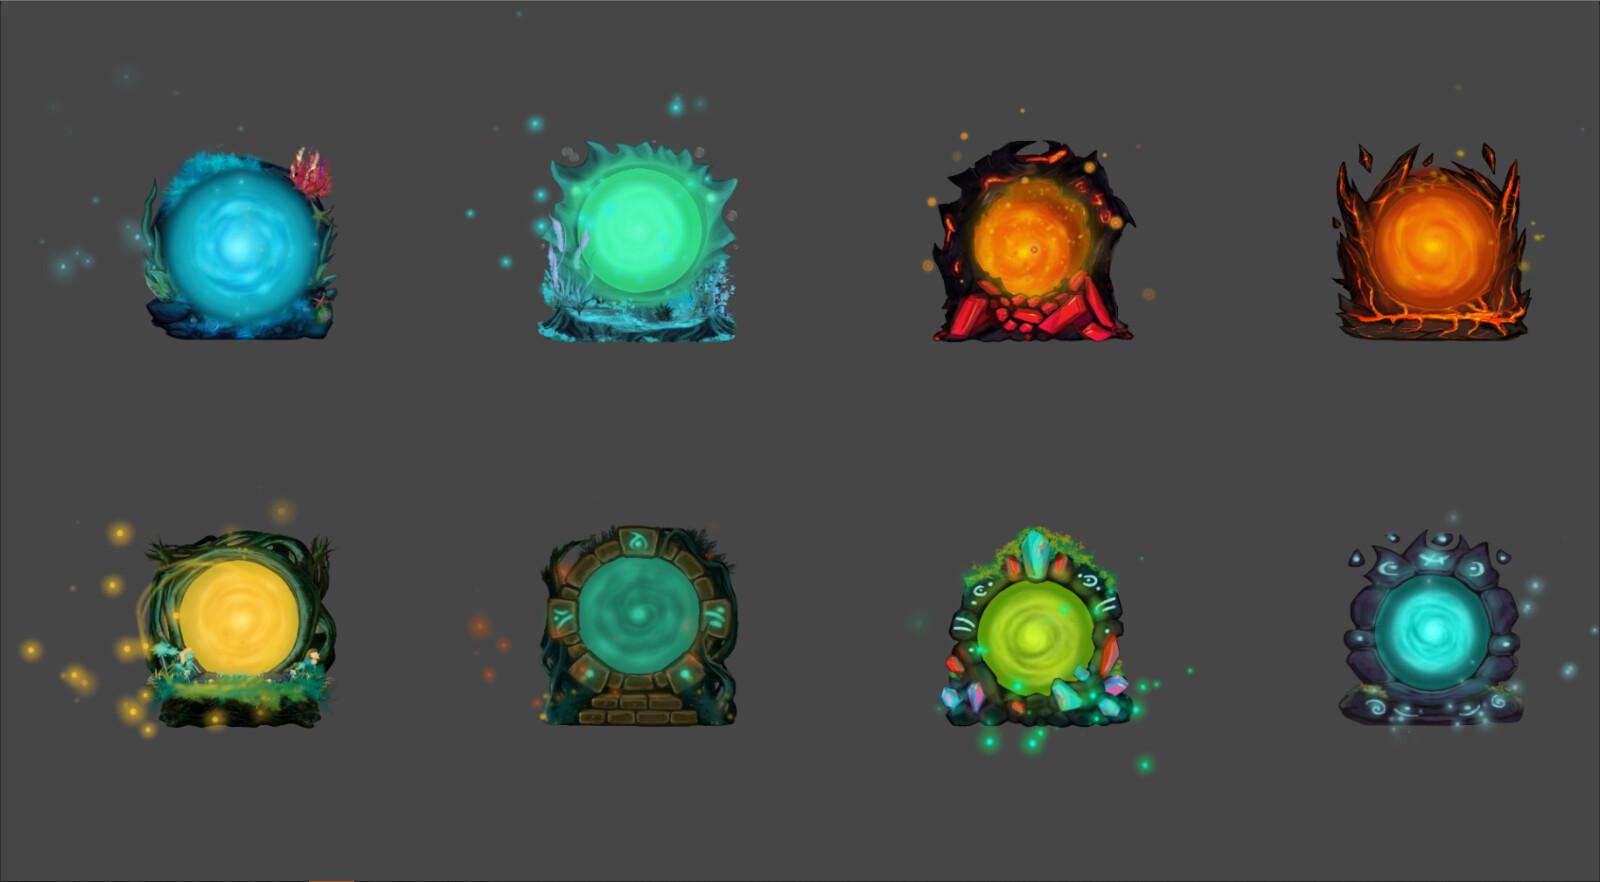 Animated Portals